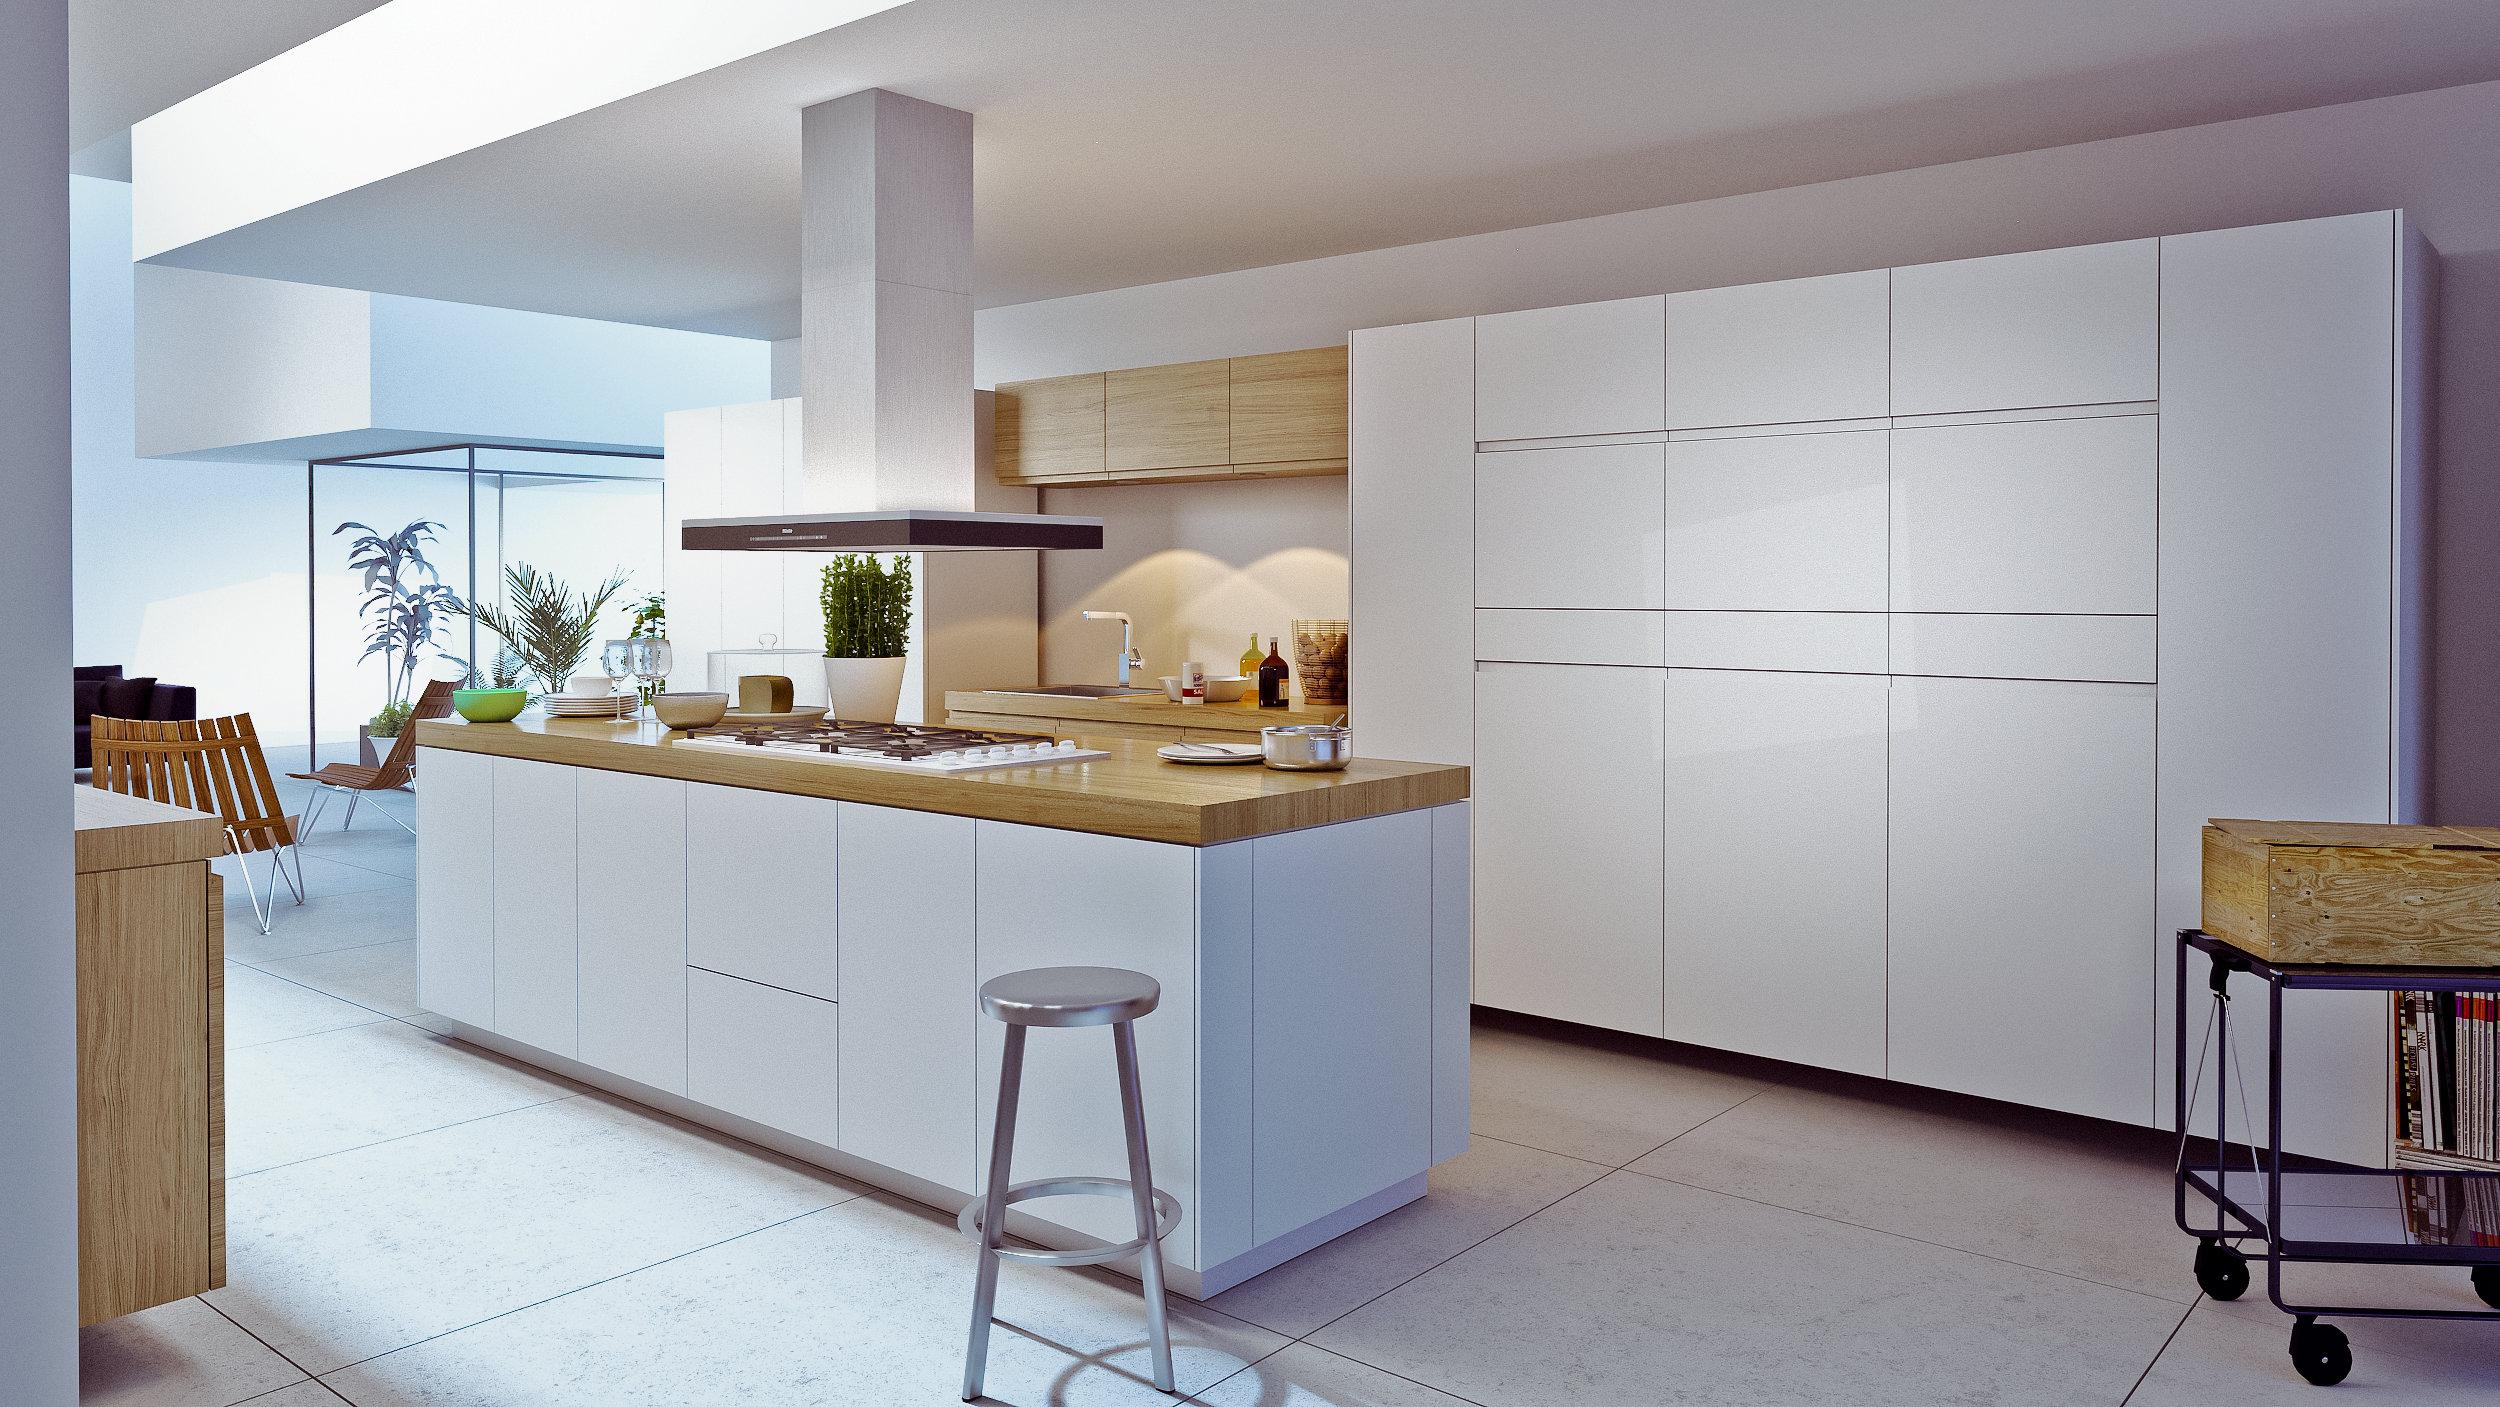 Miele_Kitchen_Appliance_Visualizer_001